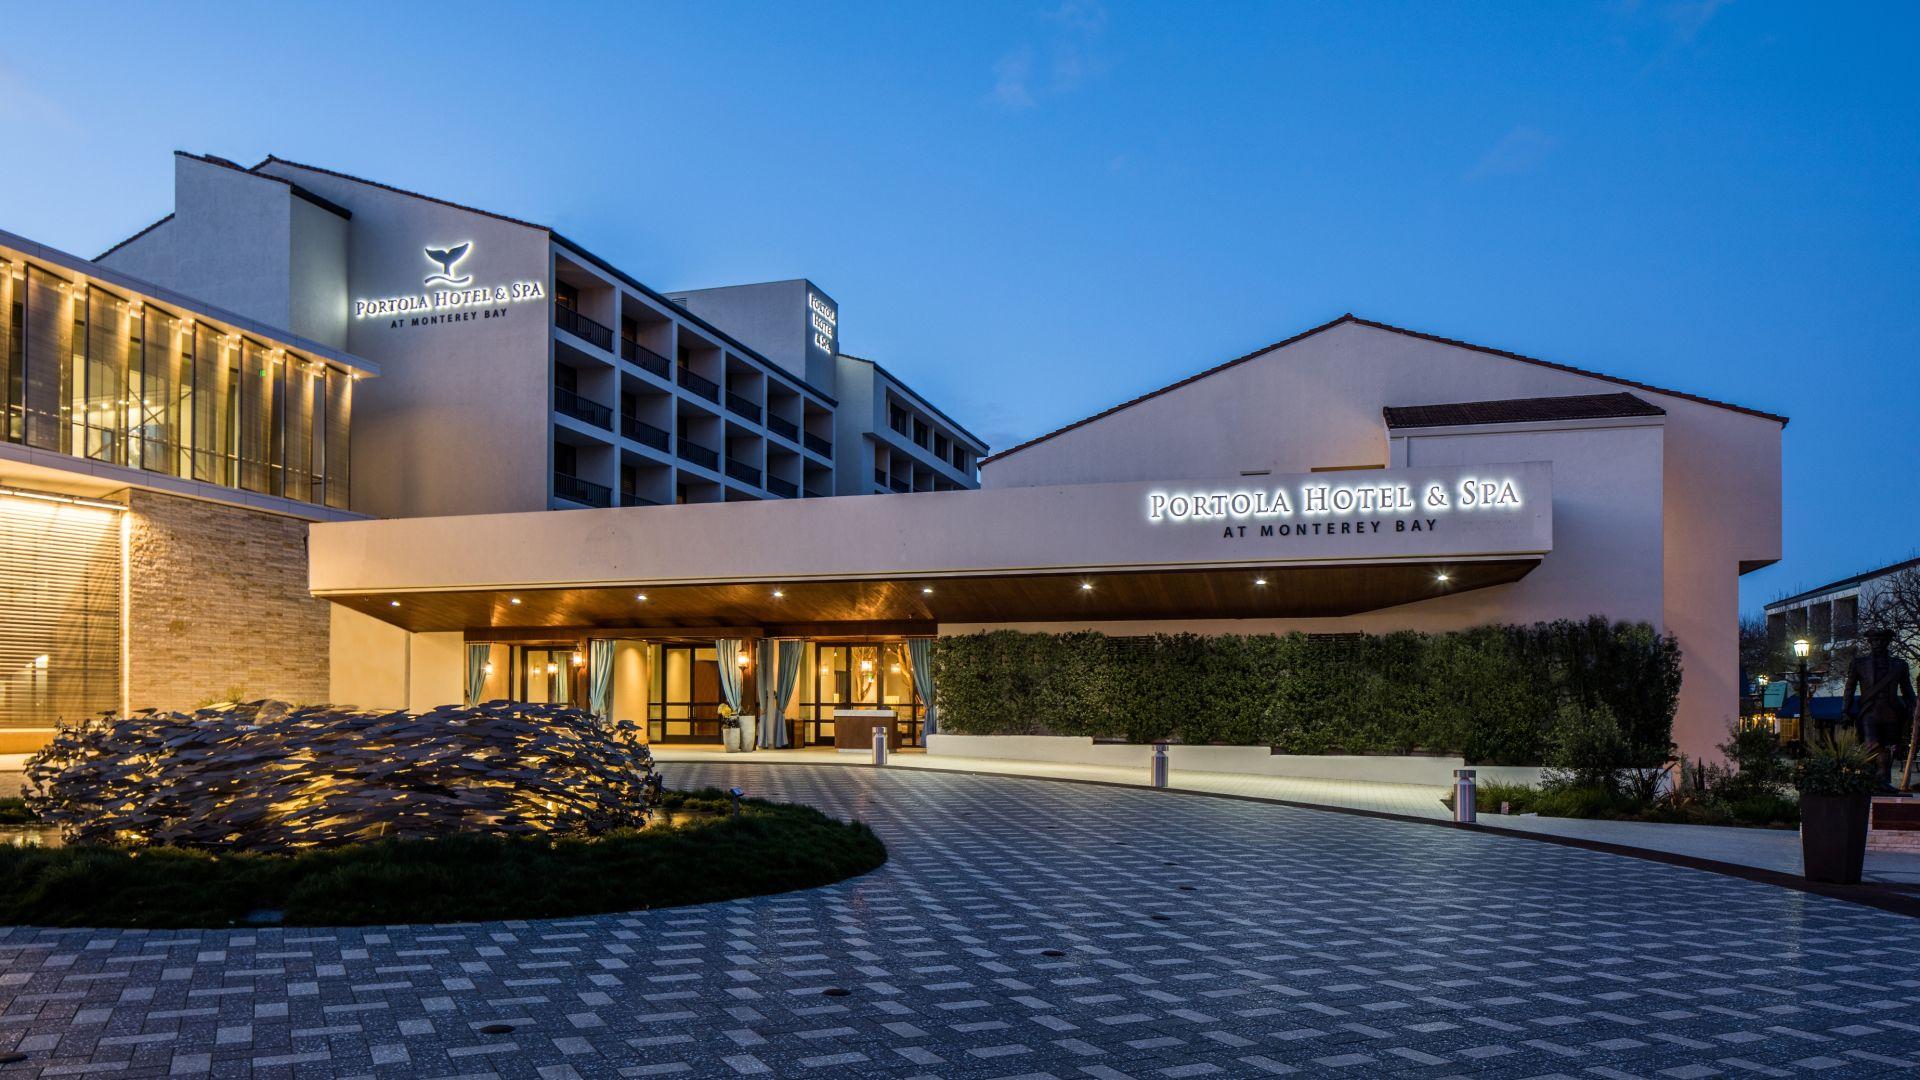 Hotels In Monterey Ca >> Monterey California Hotel Portola Hotel Spa